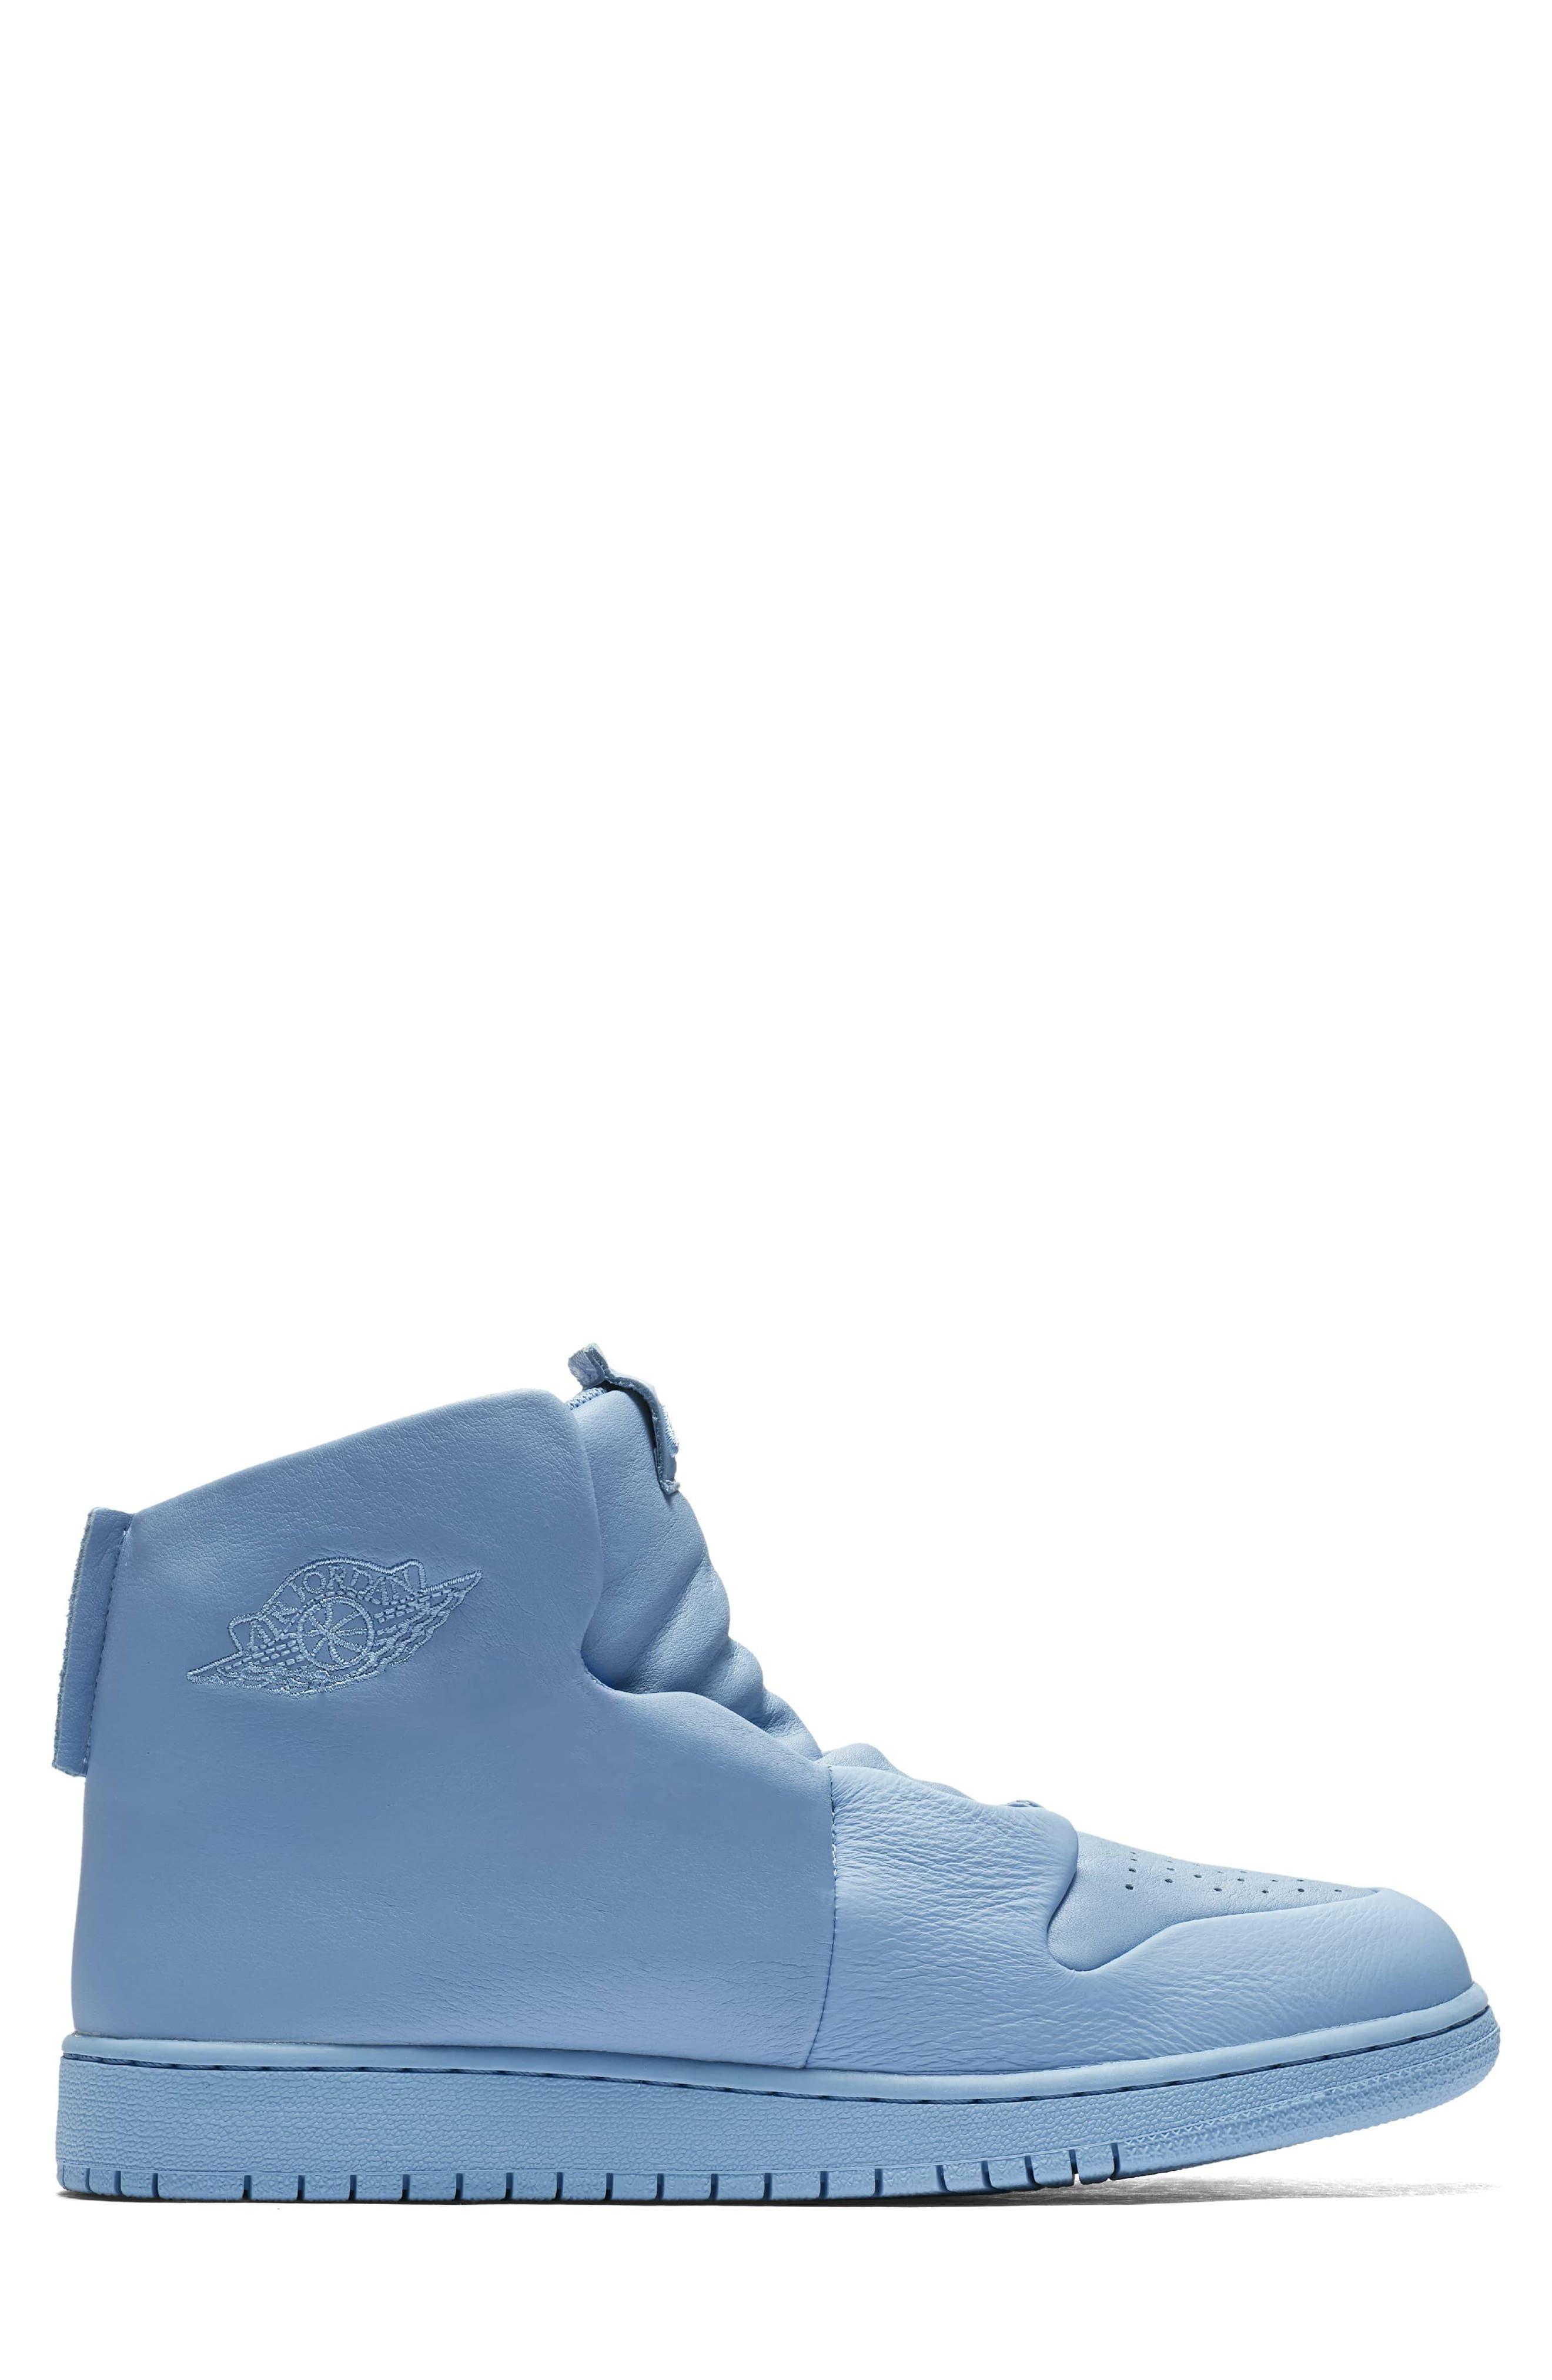 Air Jordan 1 Sage XX High Top Sneaker,                             Alternate thumbnail 3, color,                             Light Blue